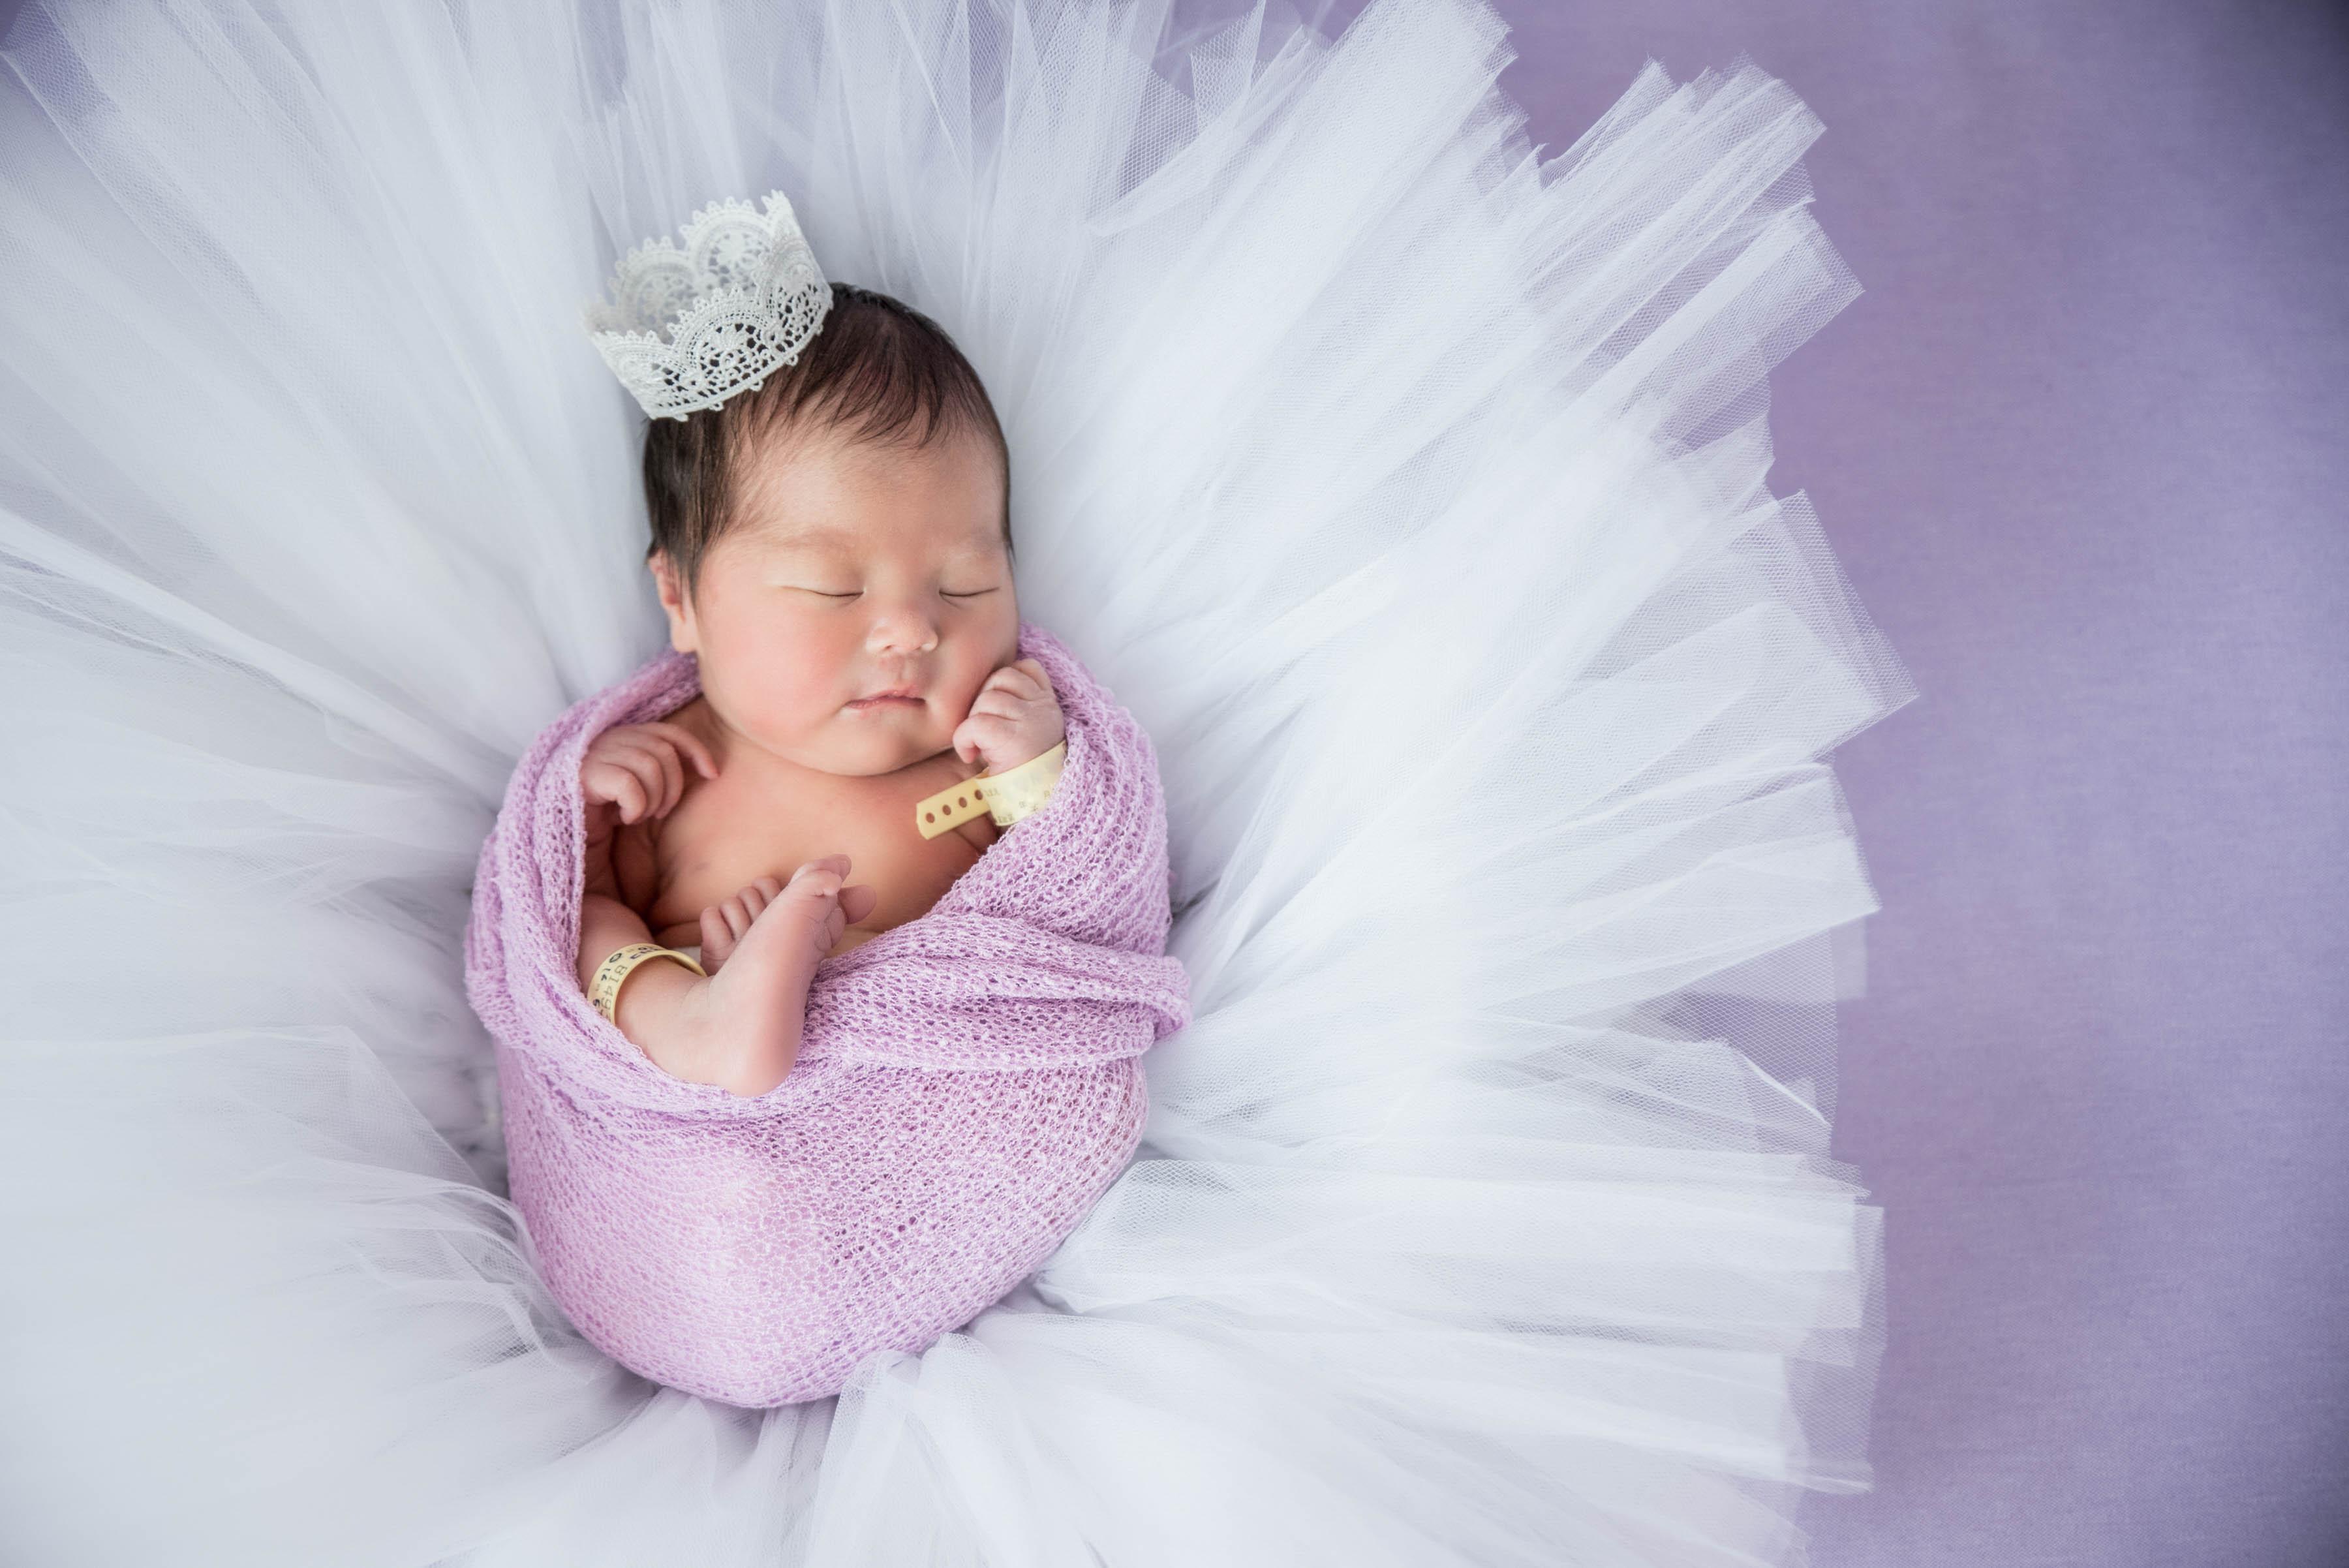 Sleeping baby photography~産科病院との提携撮影サービス